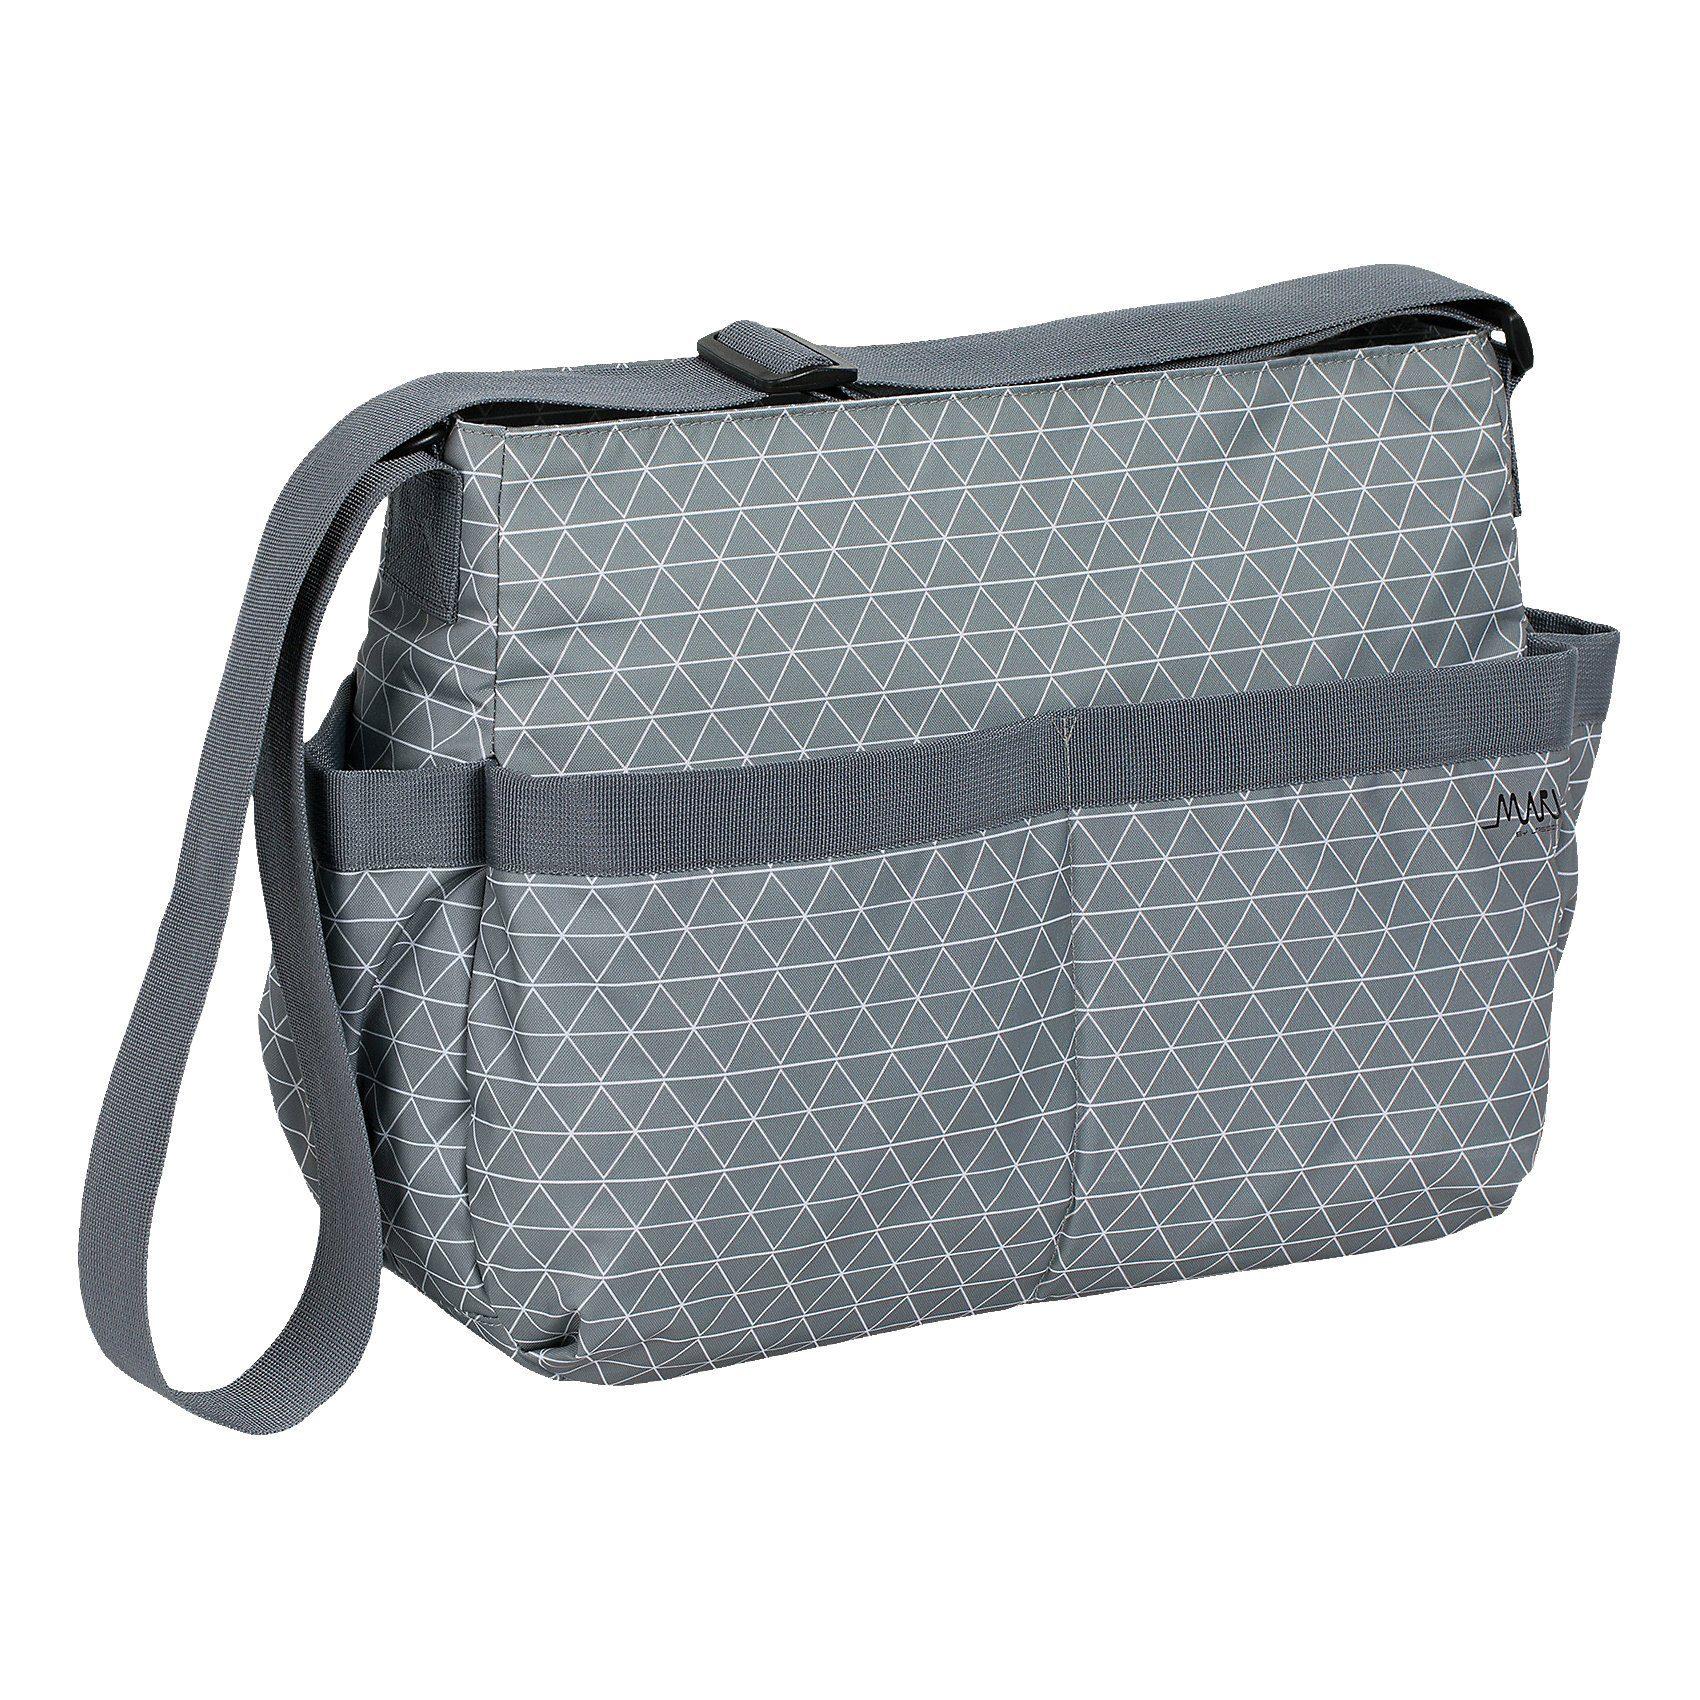 Lässig Wickeltasche Marv, Shoulder Bag, Tiles grey